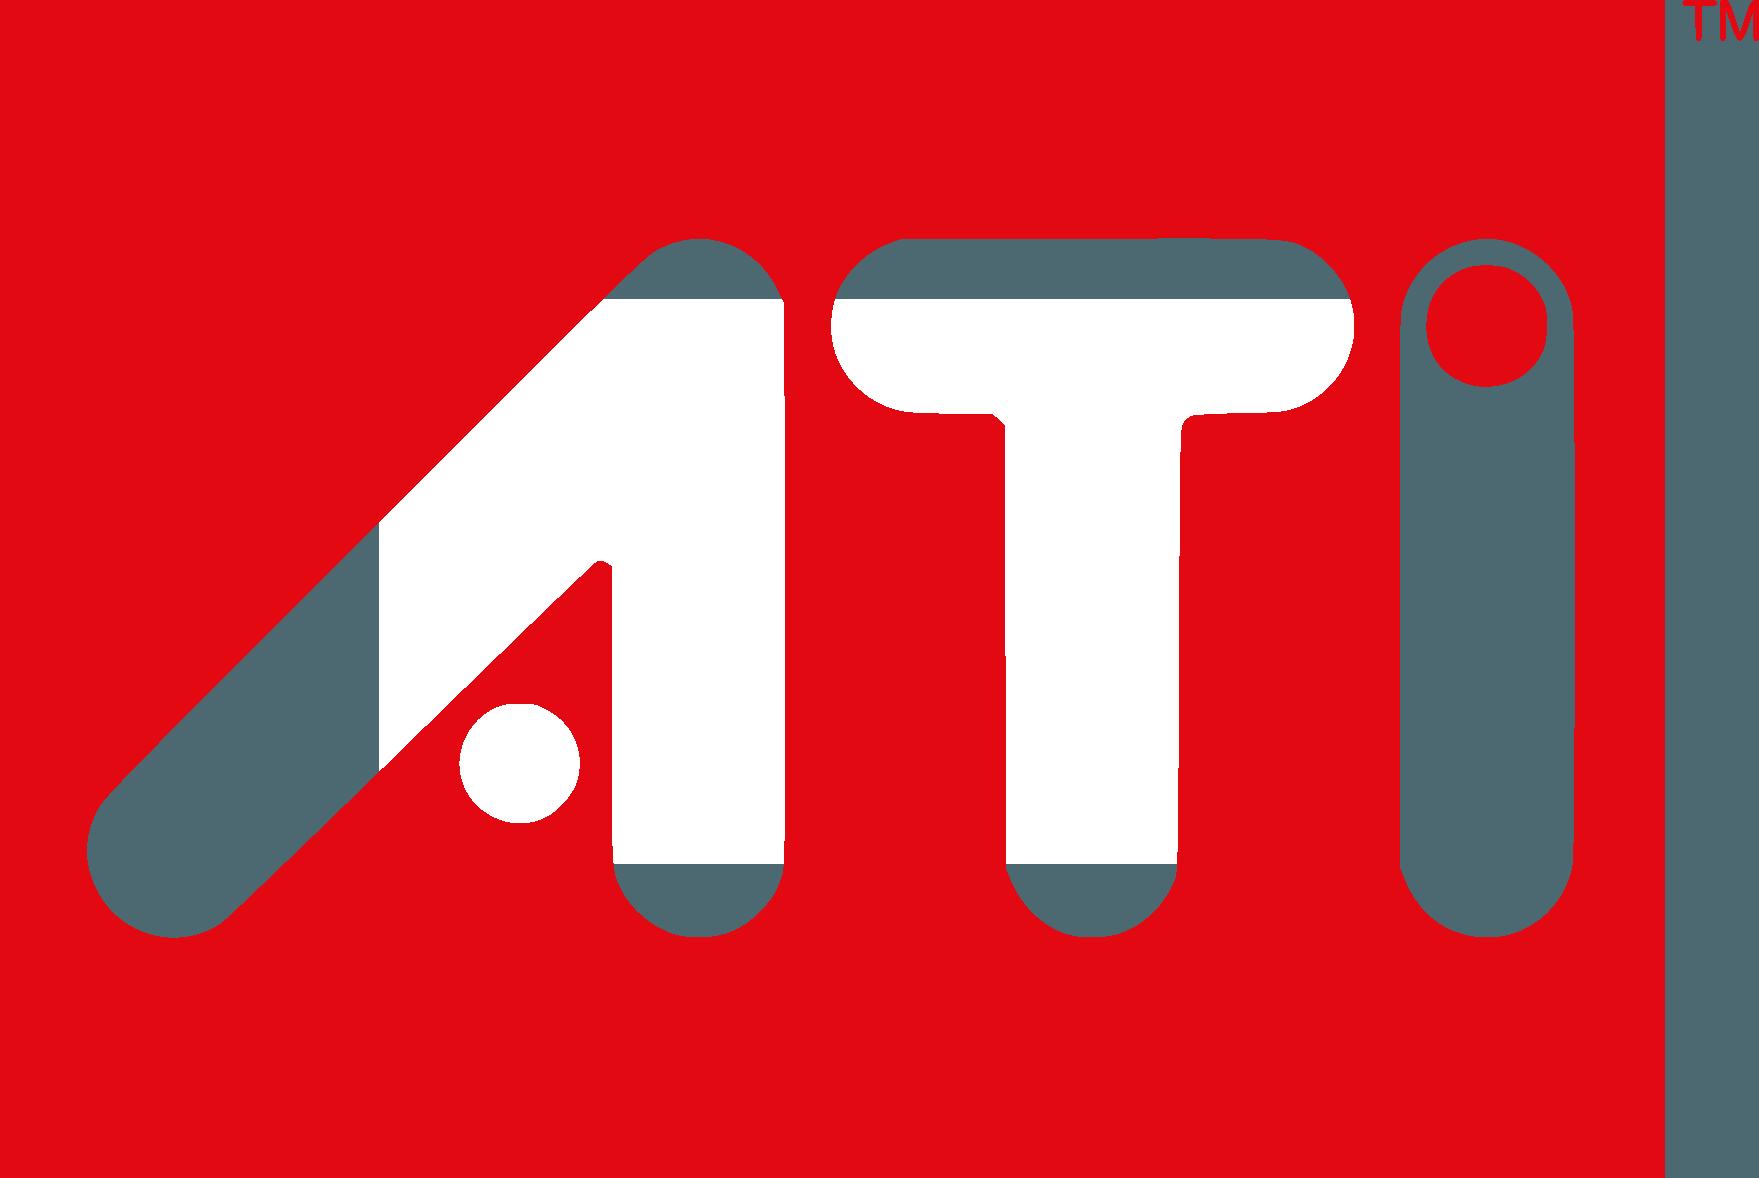 ATI Logo png